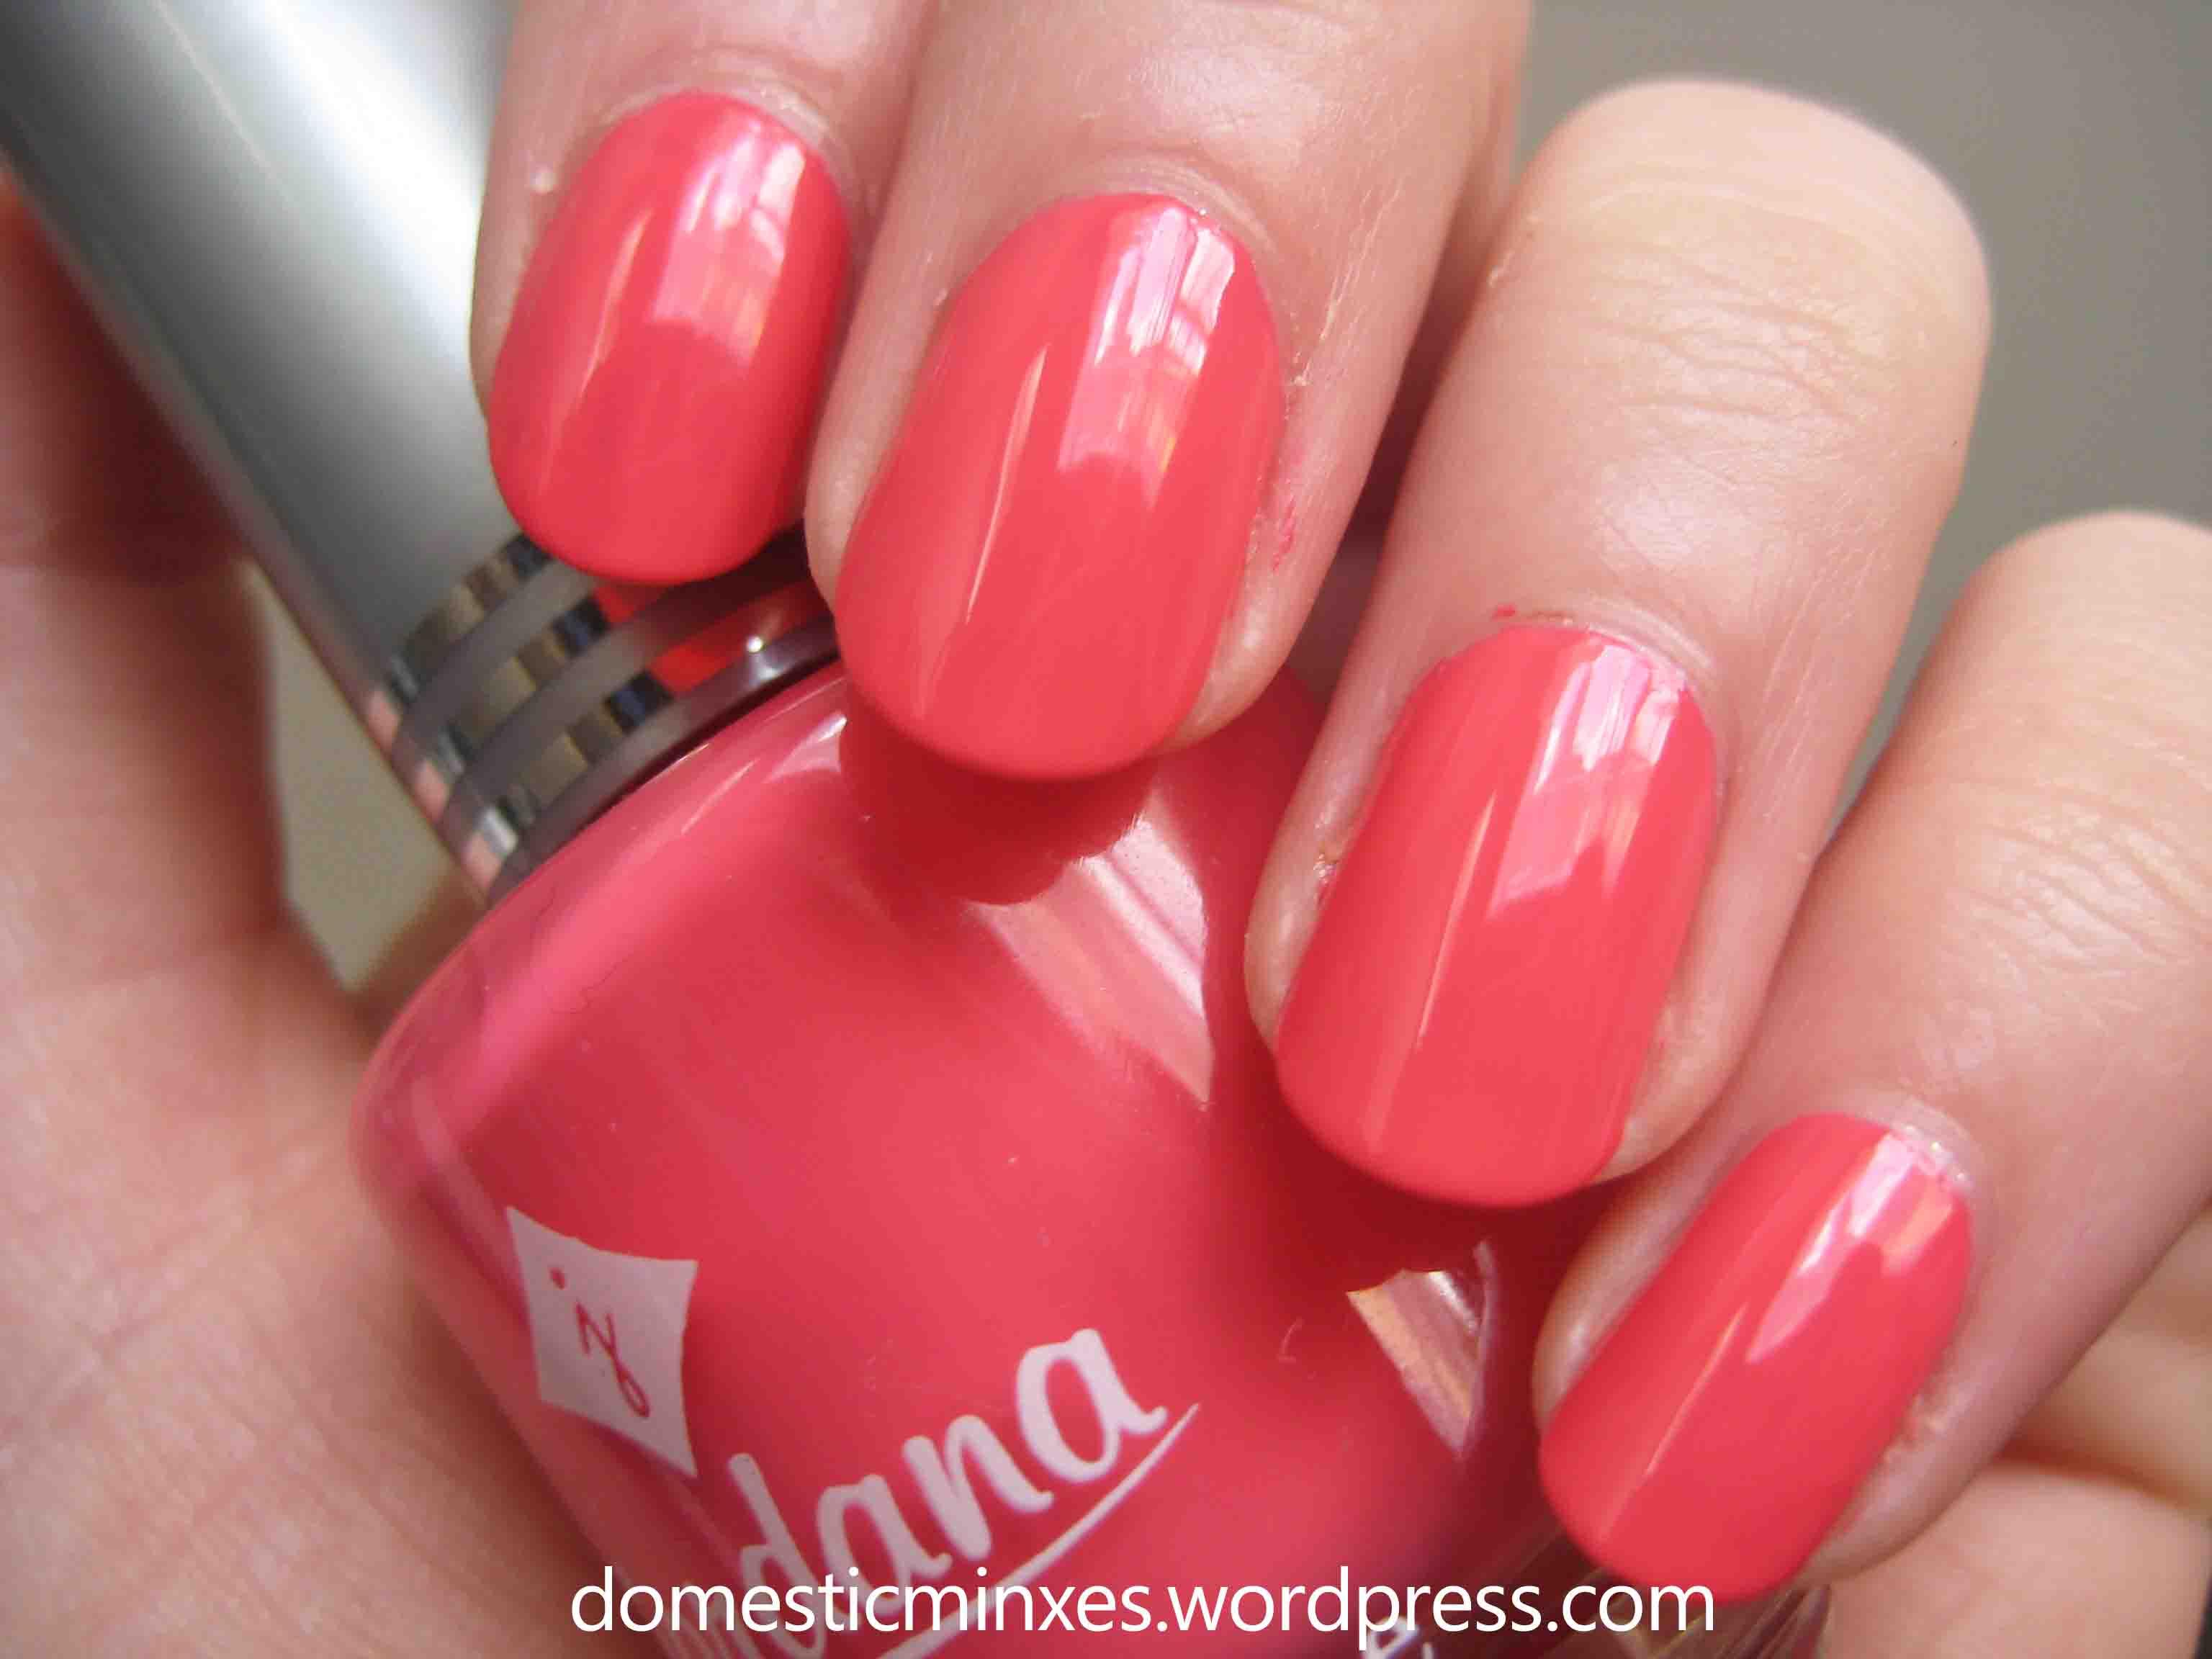 Jordana Nail Polish Swatches | DomesticMinxes